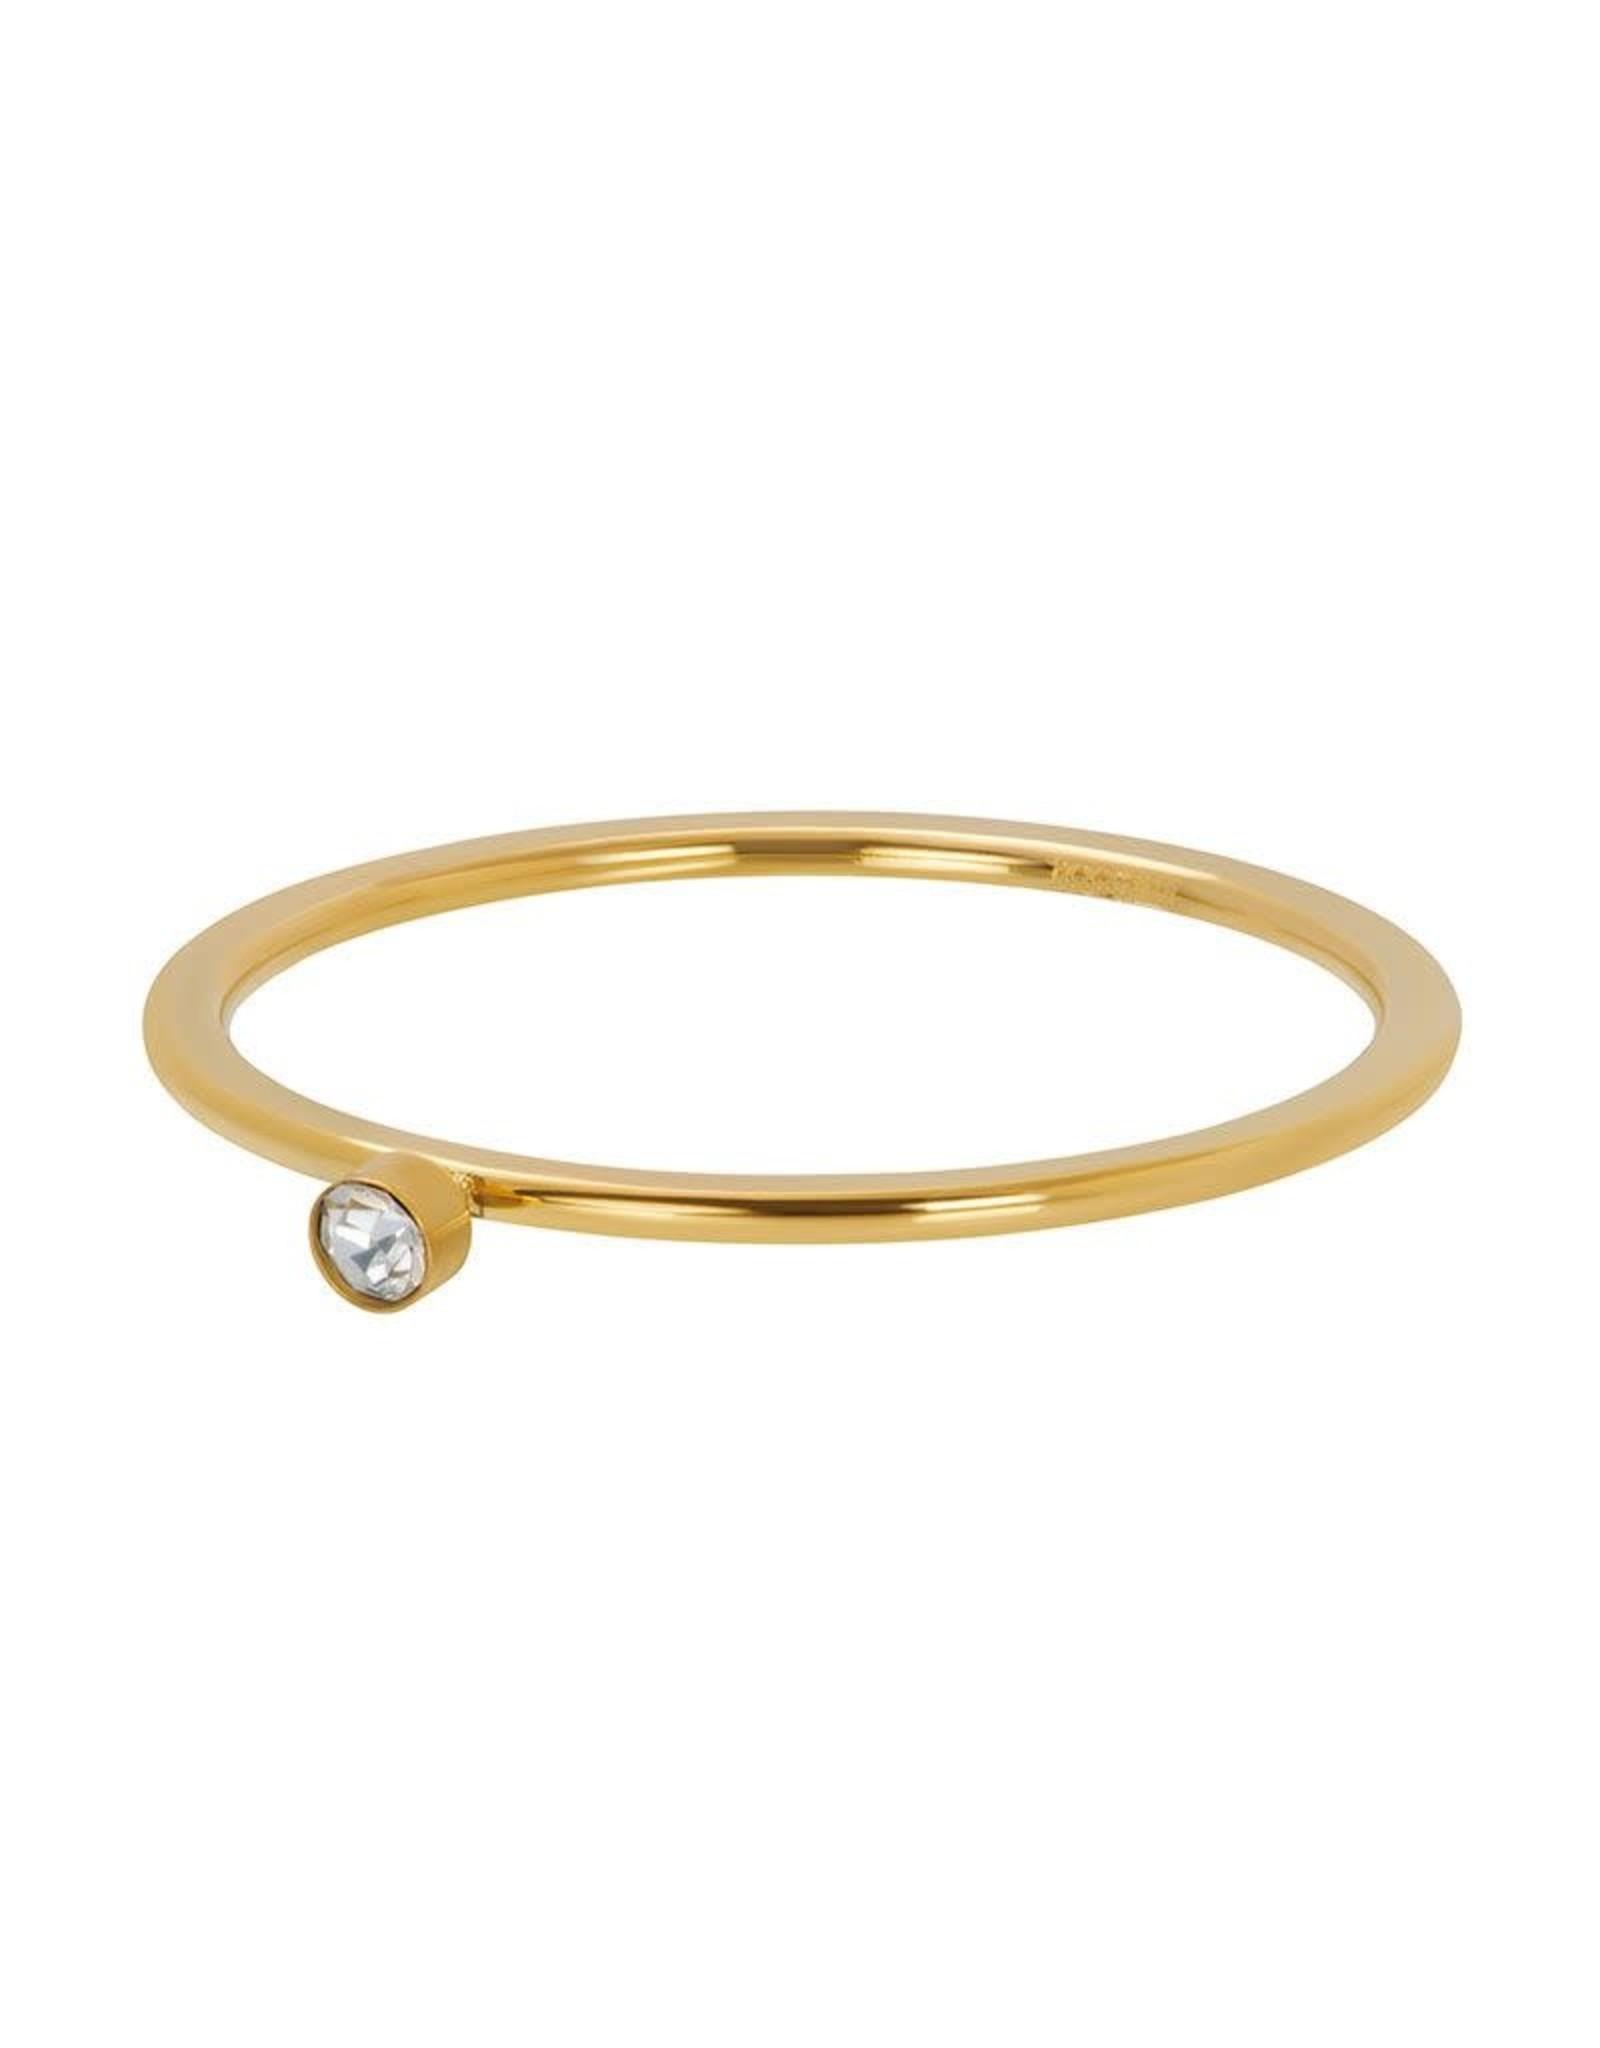 IXXXI IXXXI Zirconia 1 Stone Crystal ring Gold